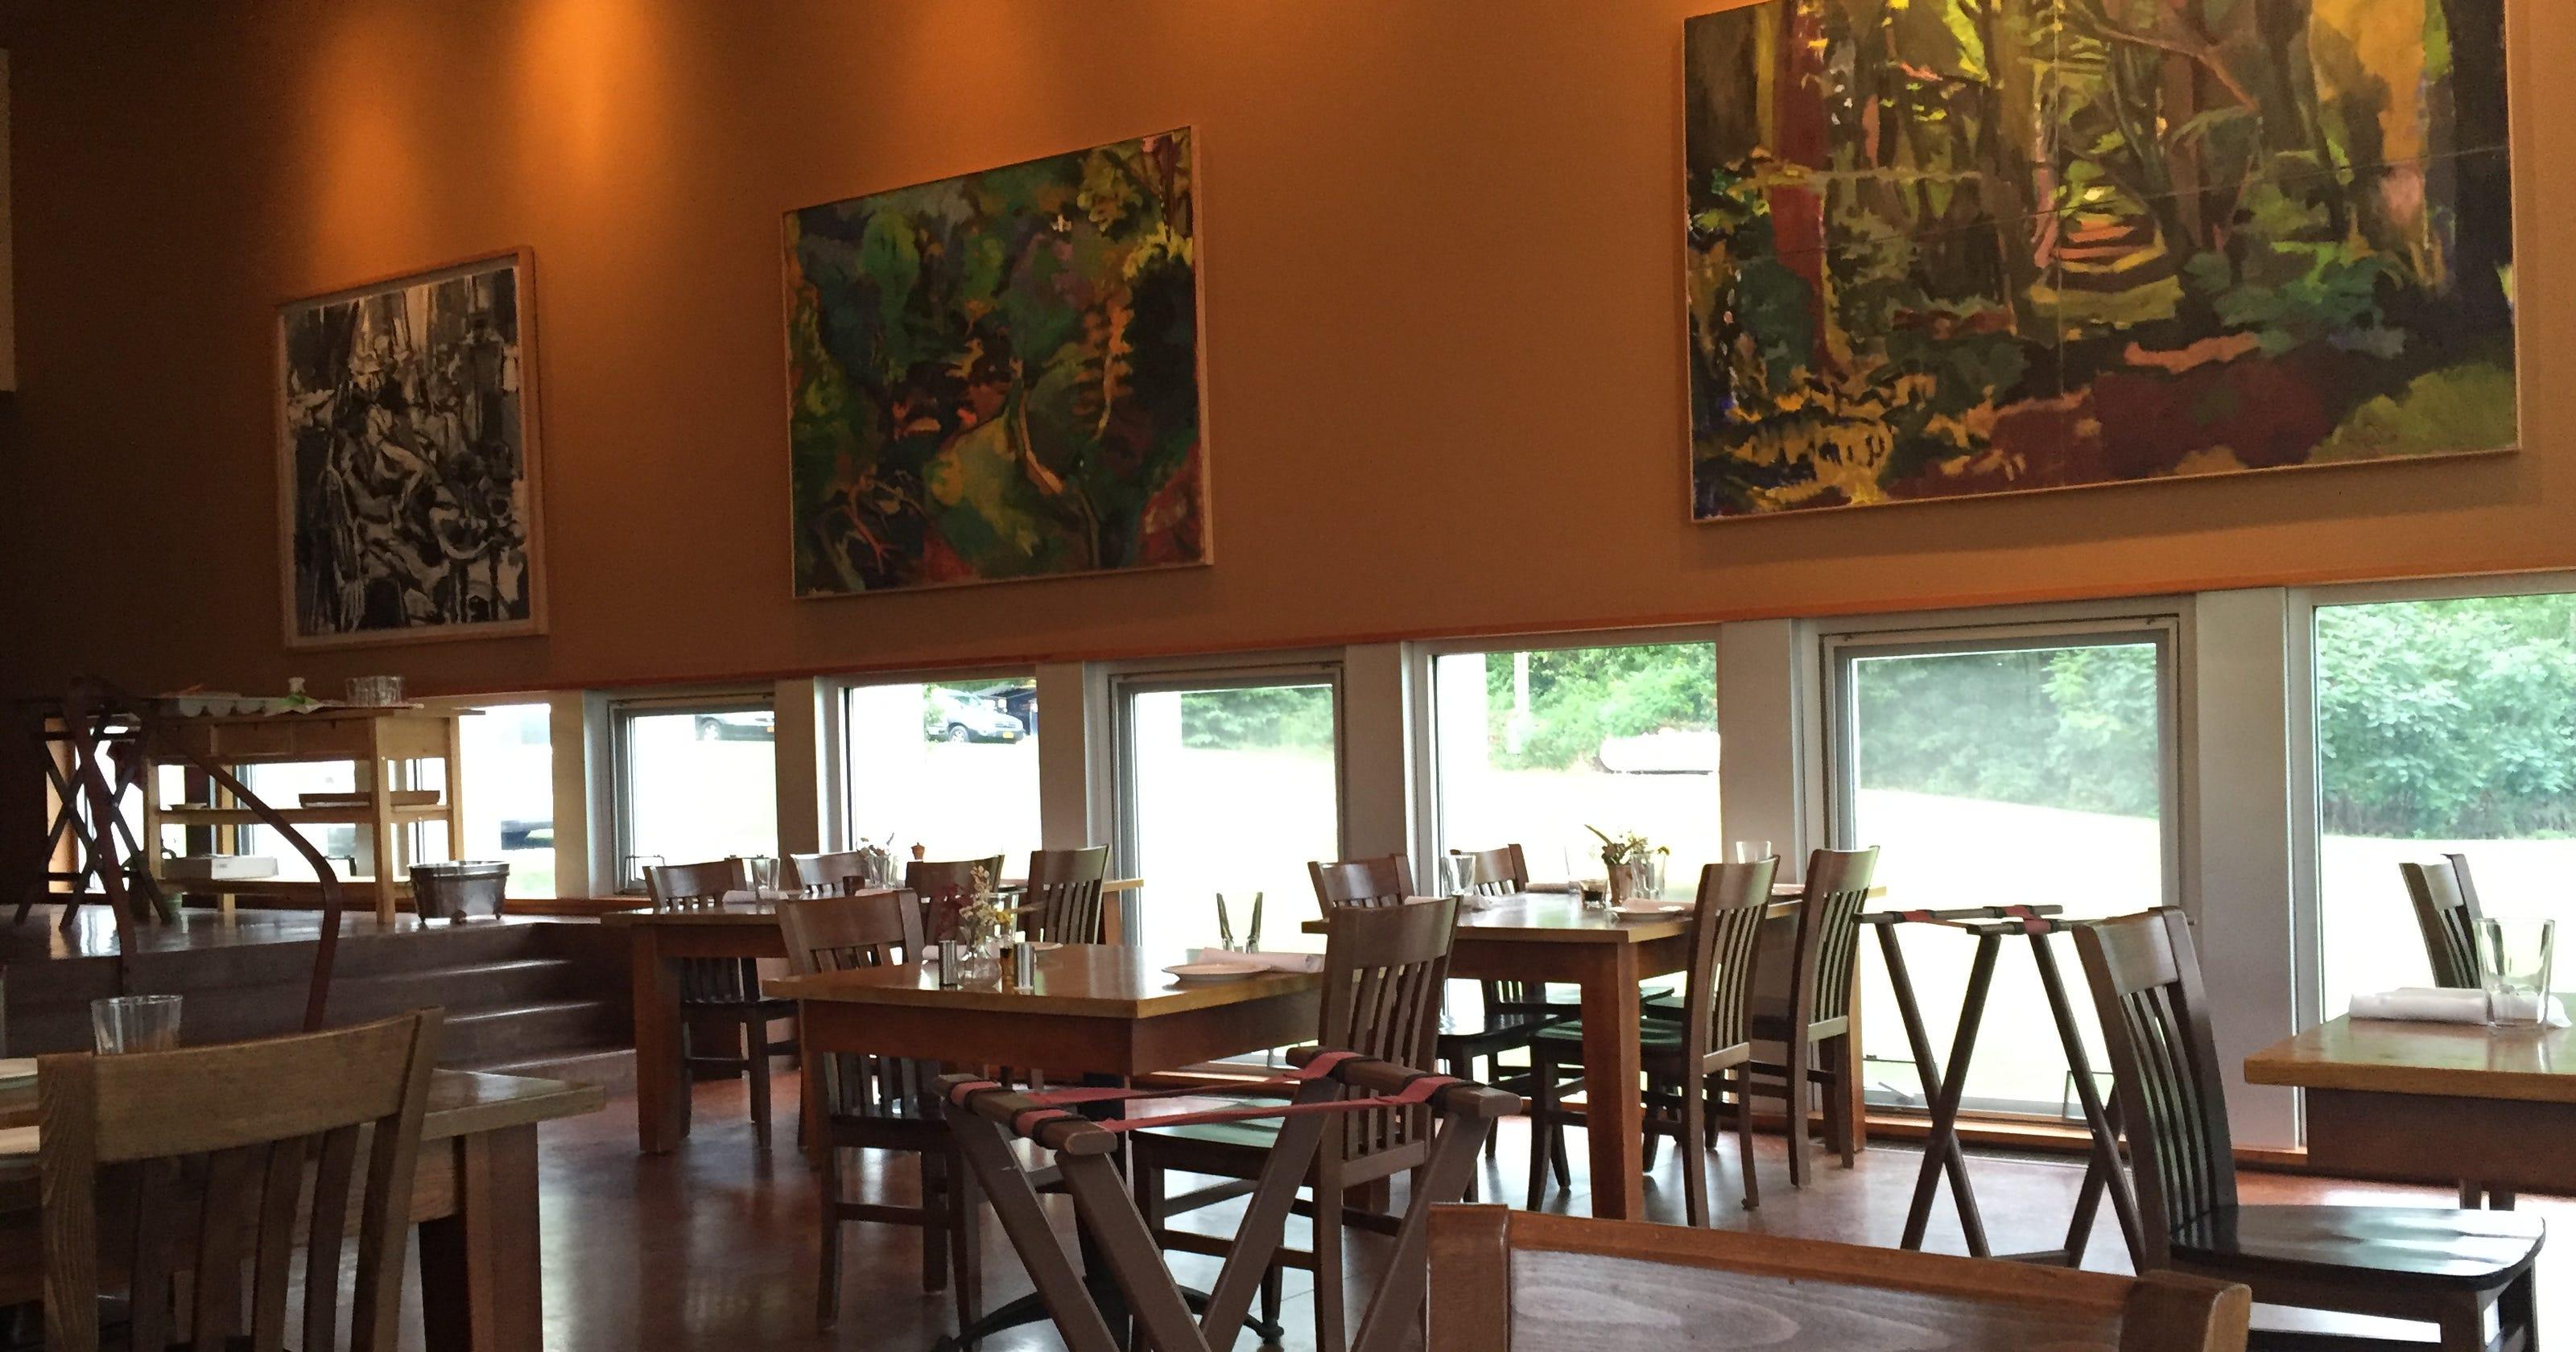 Finger Lakes Restaurant Offers Idyllic Setting